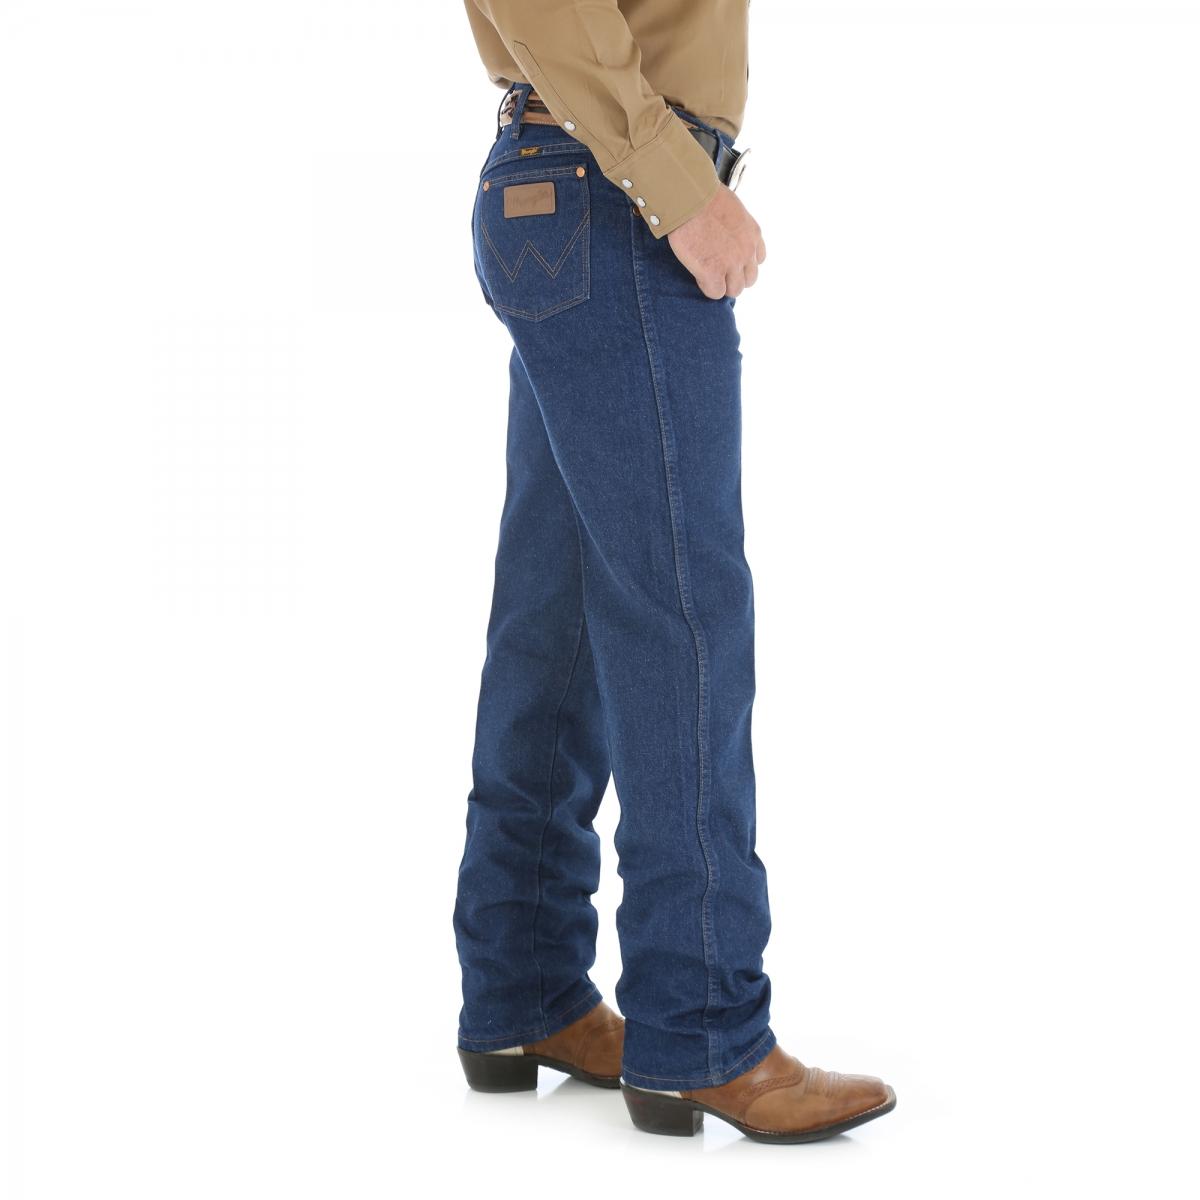 jeans_wrangler_13mwzpw_side